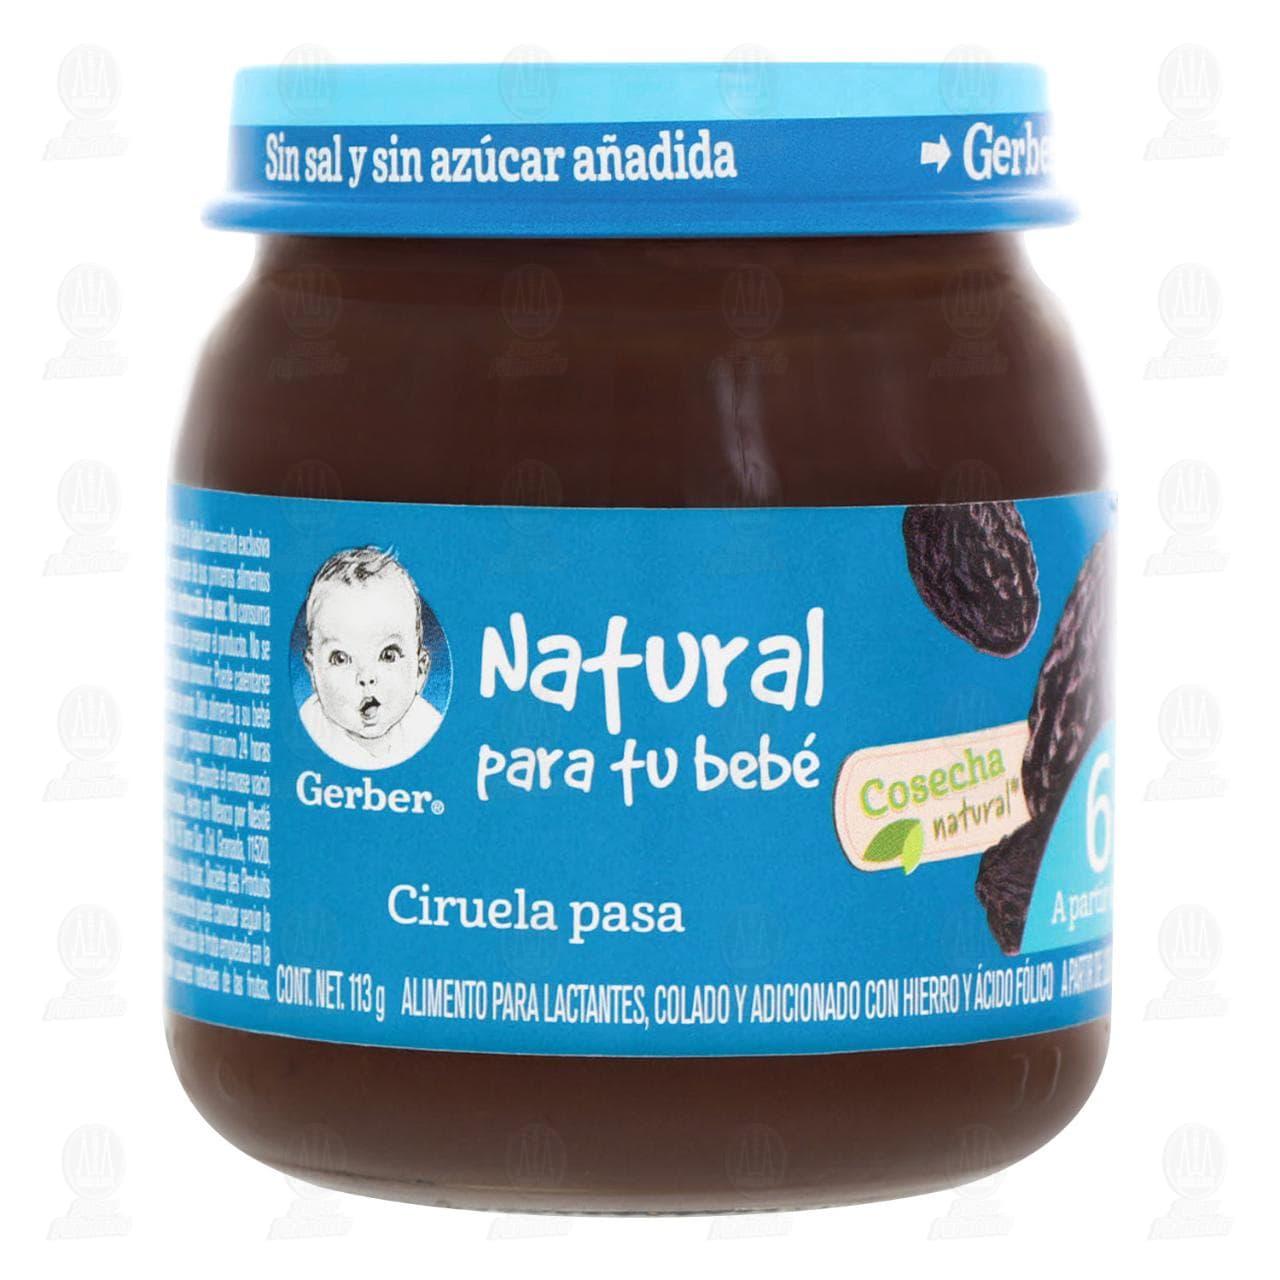 Comprar Papilla Gerber Cosecha Natural de Ciruela Pasa, a Partir de 6 Meses, 113 gr. en Farmacias Guadalajara